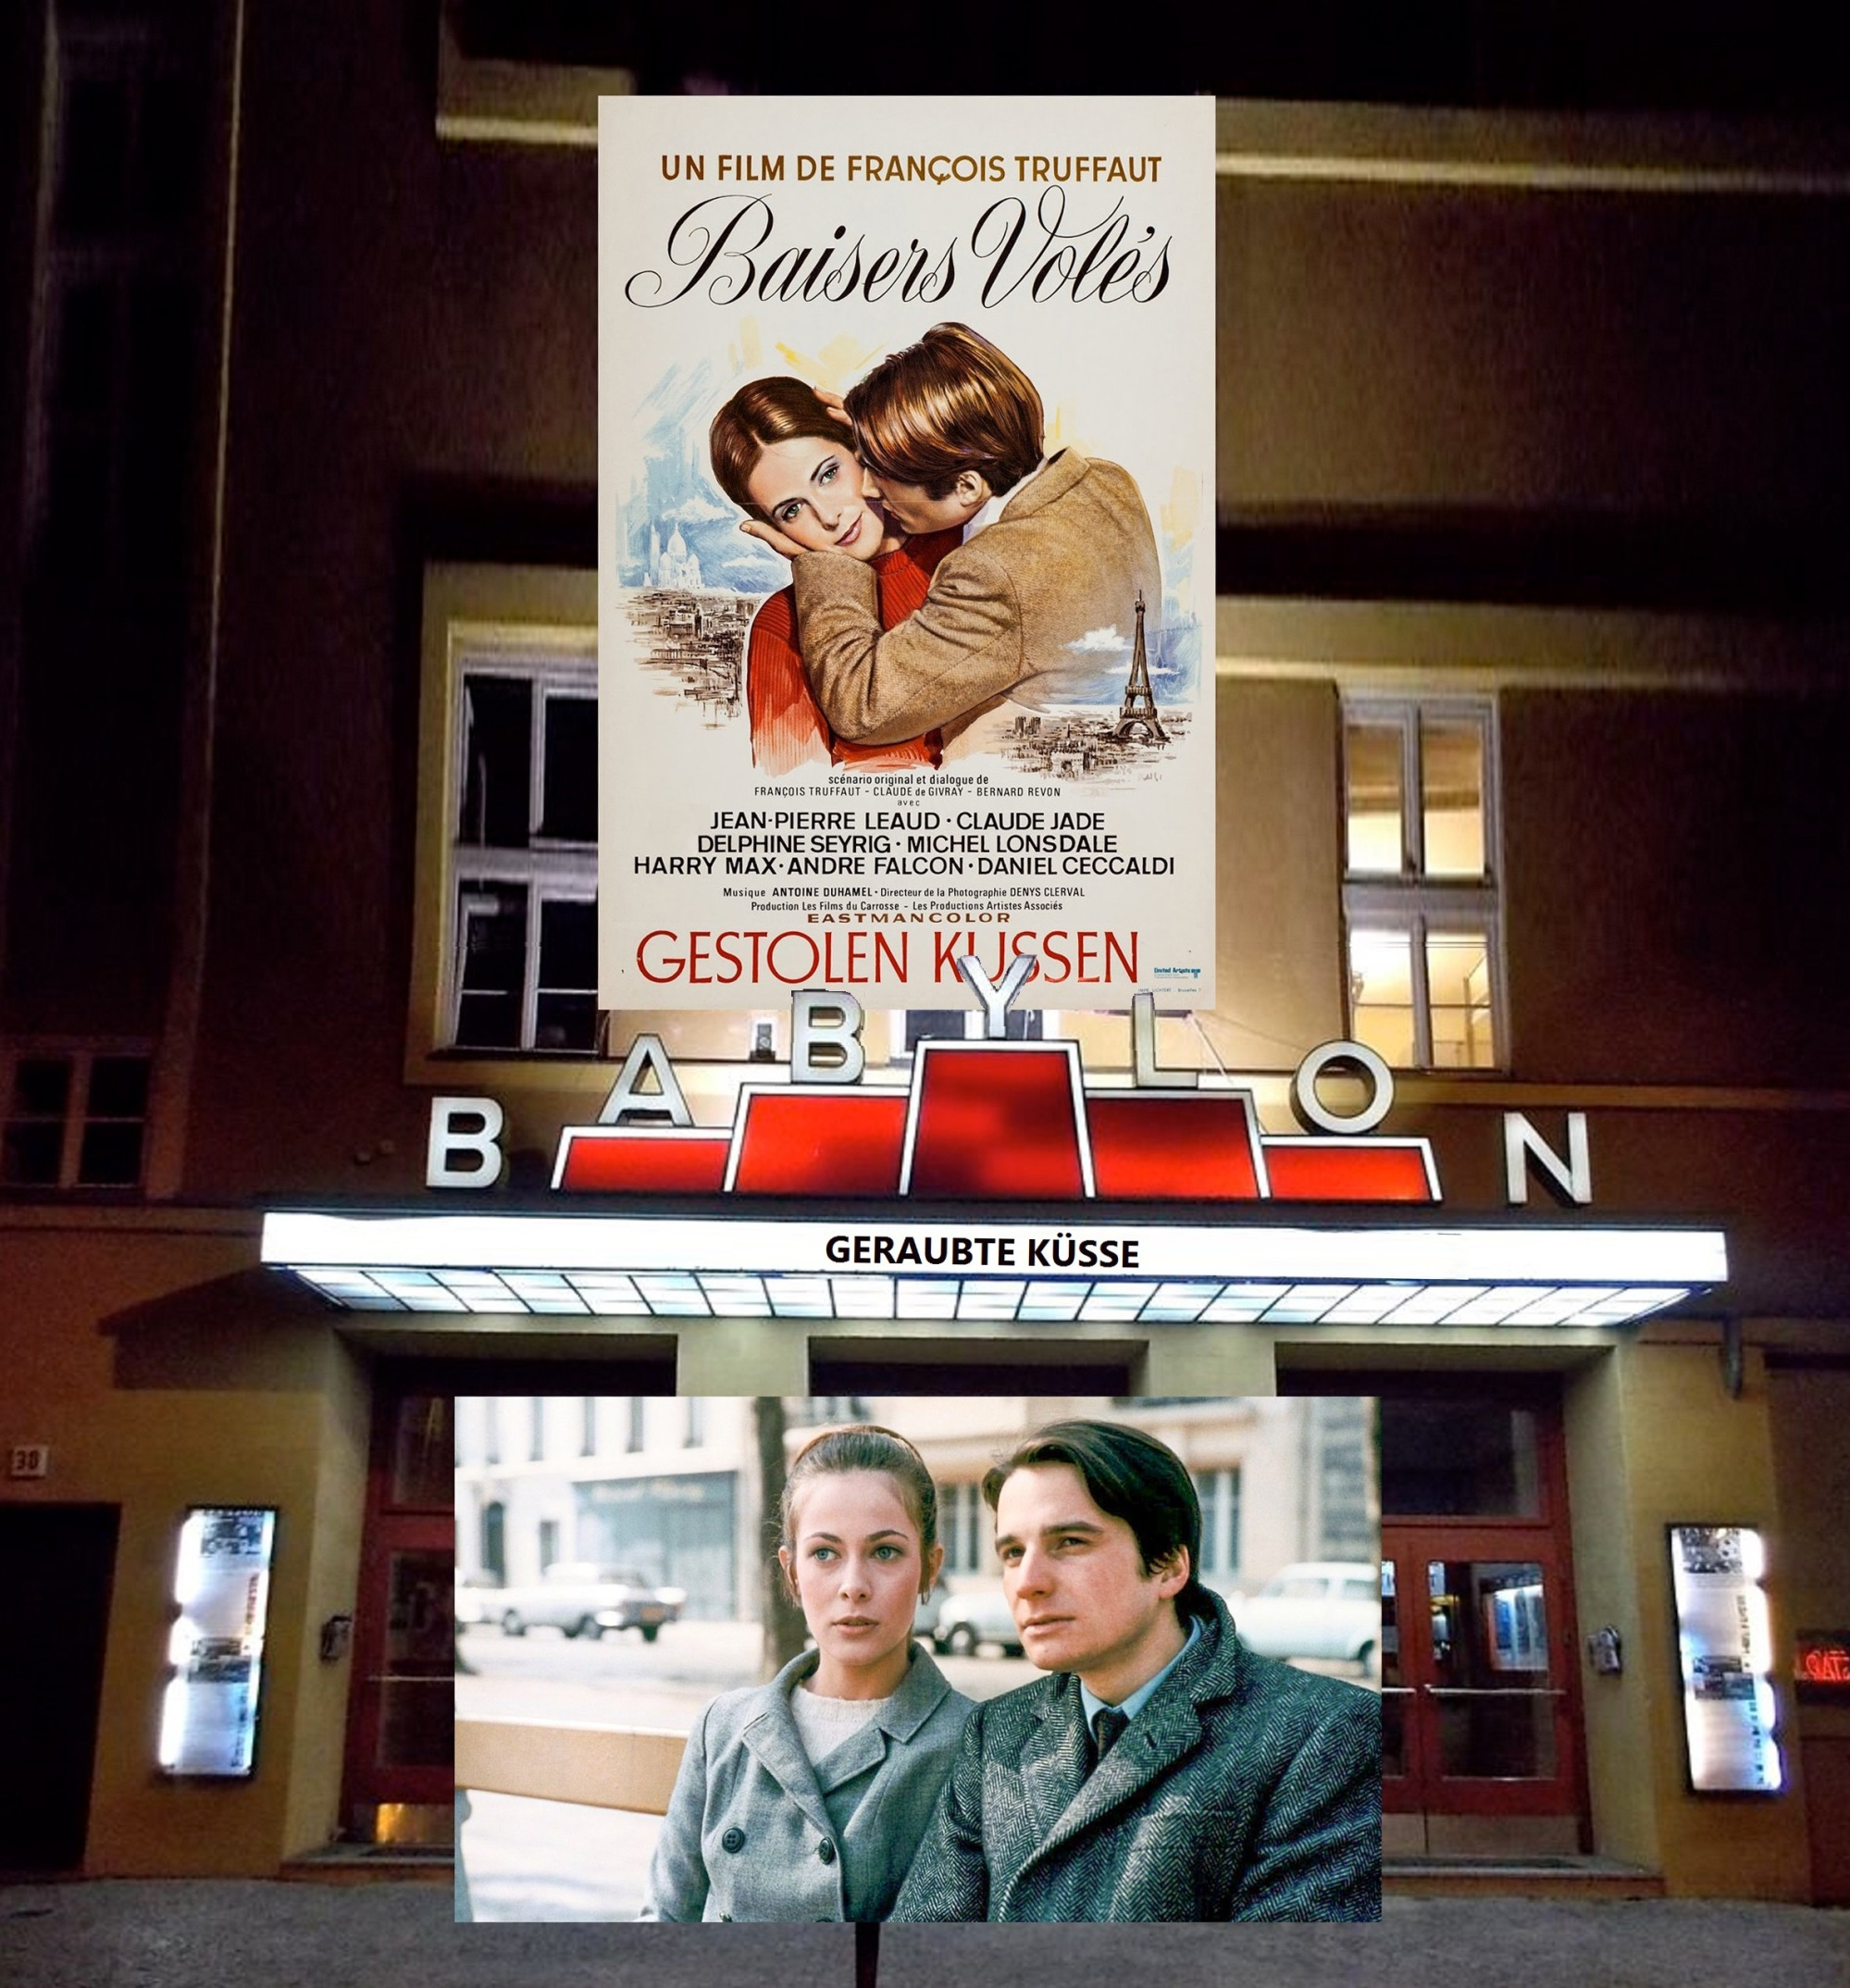 Babylon berlin kino geraubte kuesse truffaut